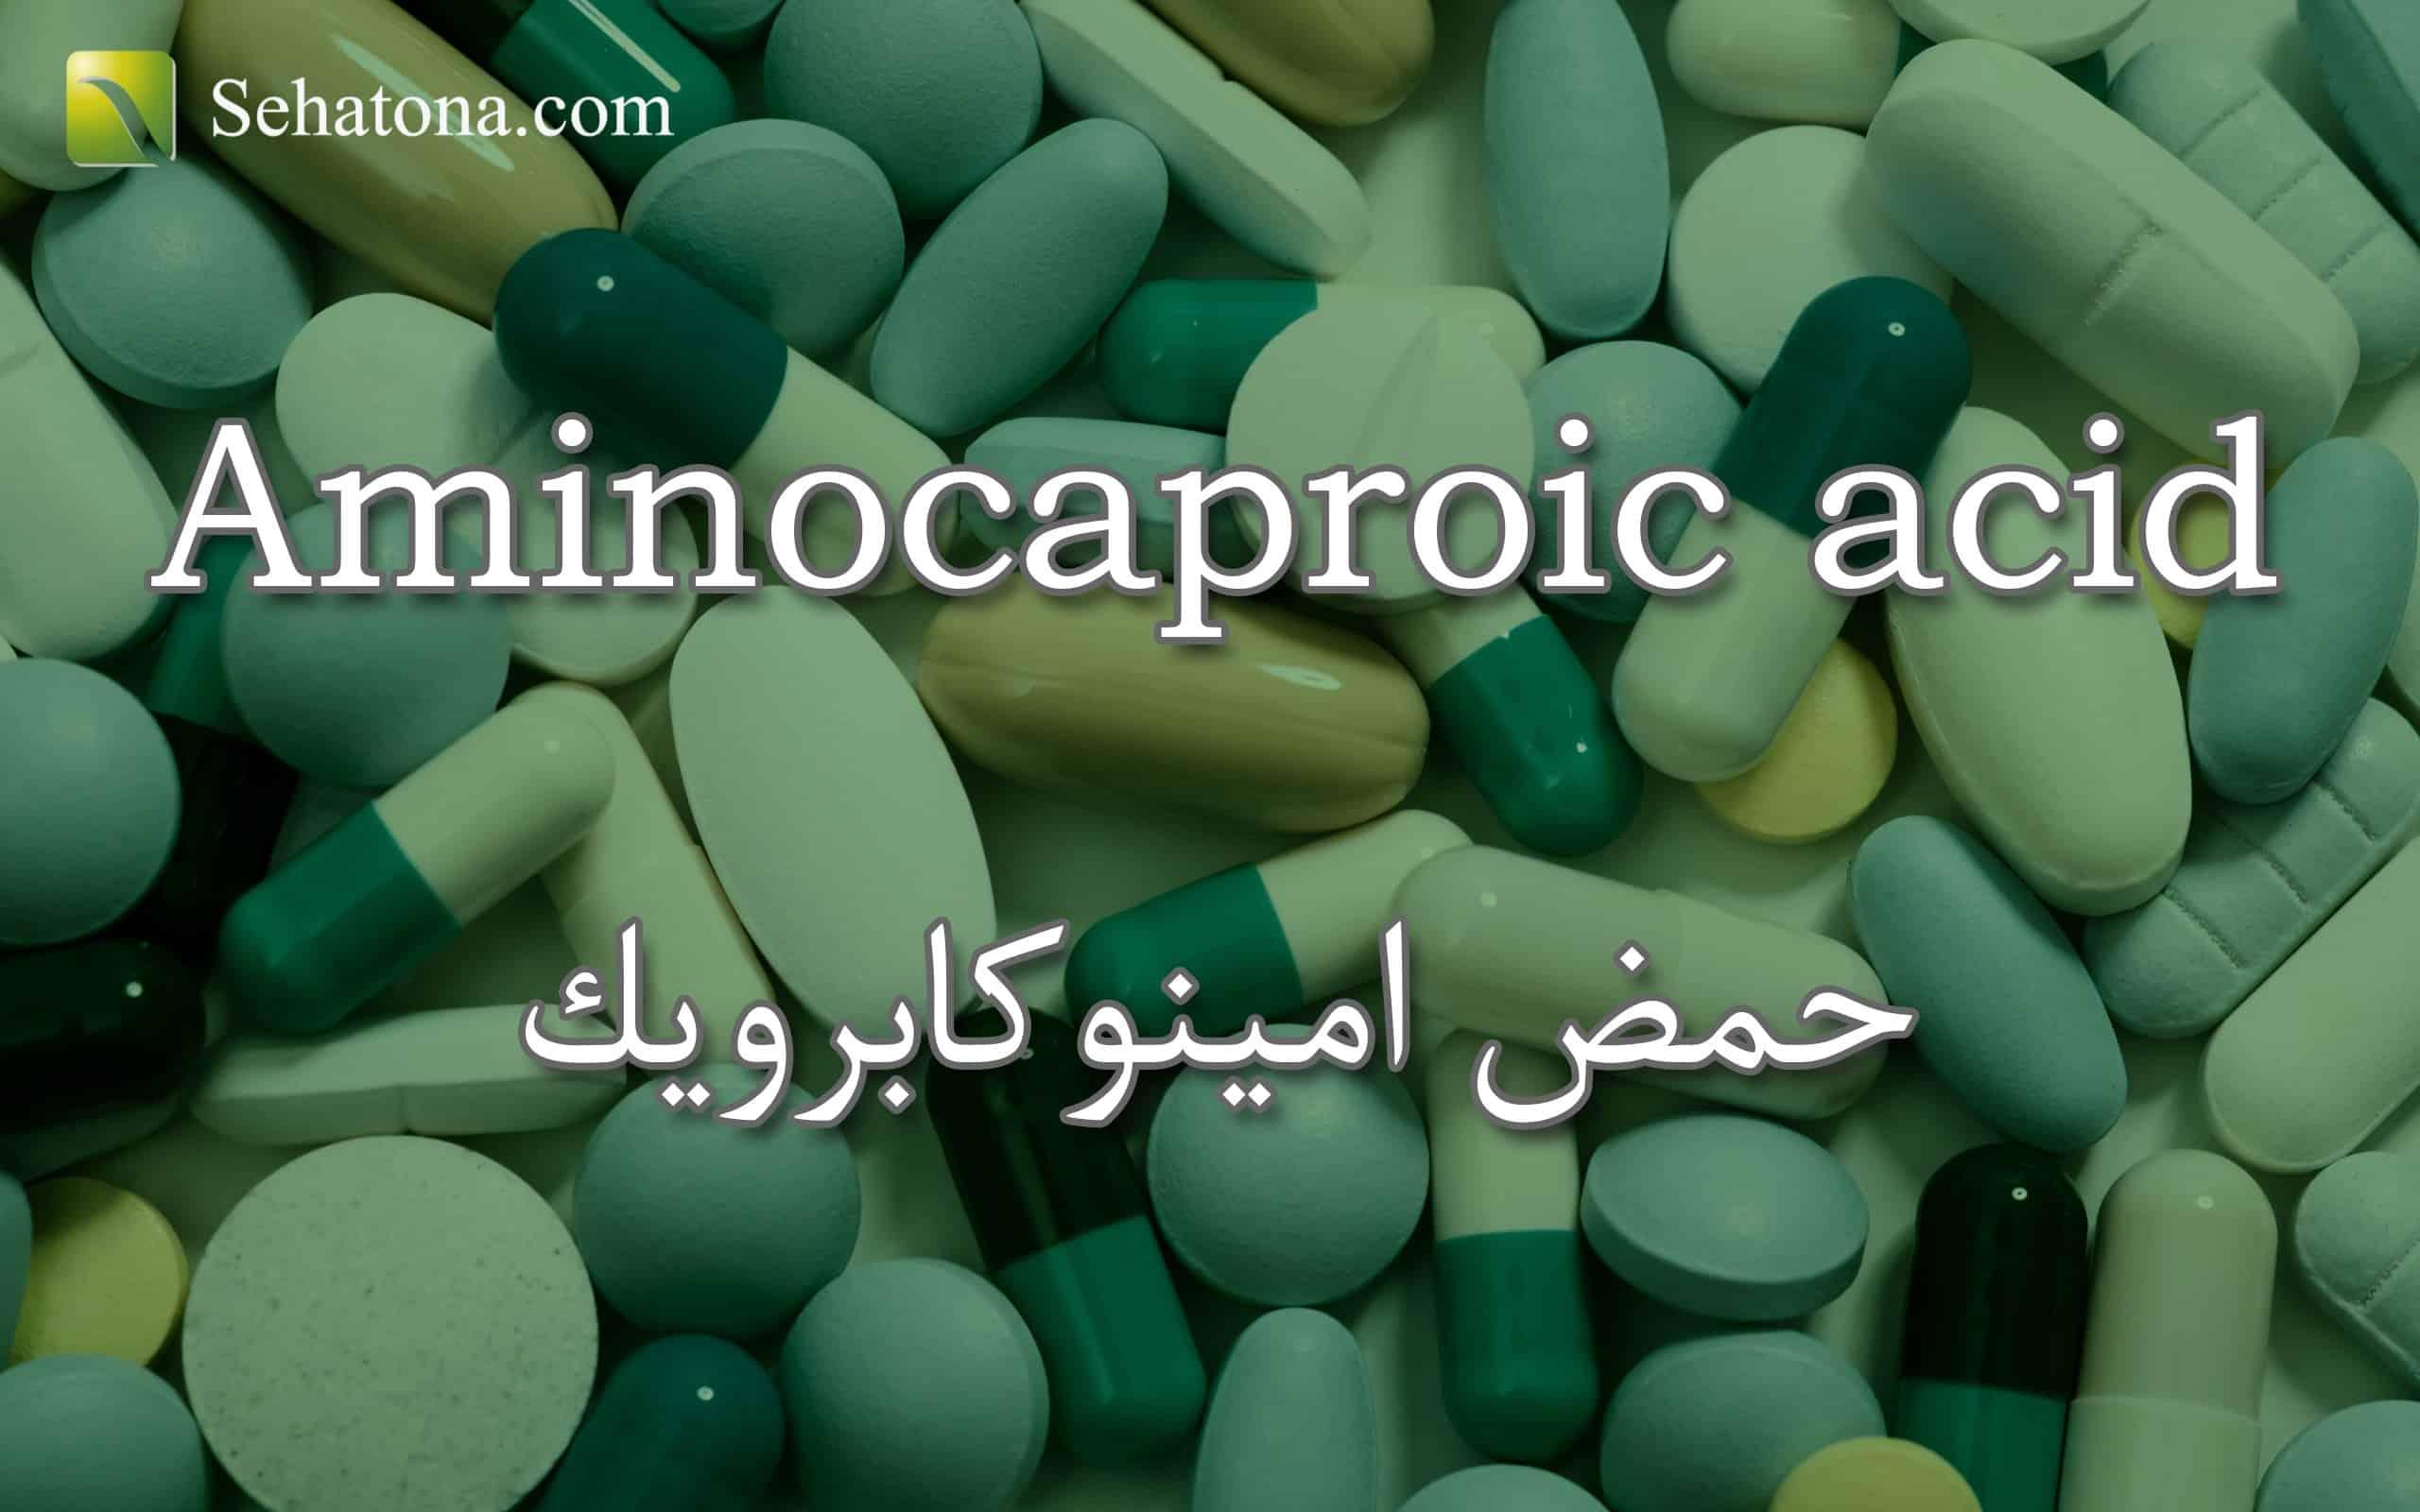 Aminocaproic acid